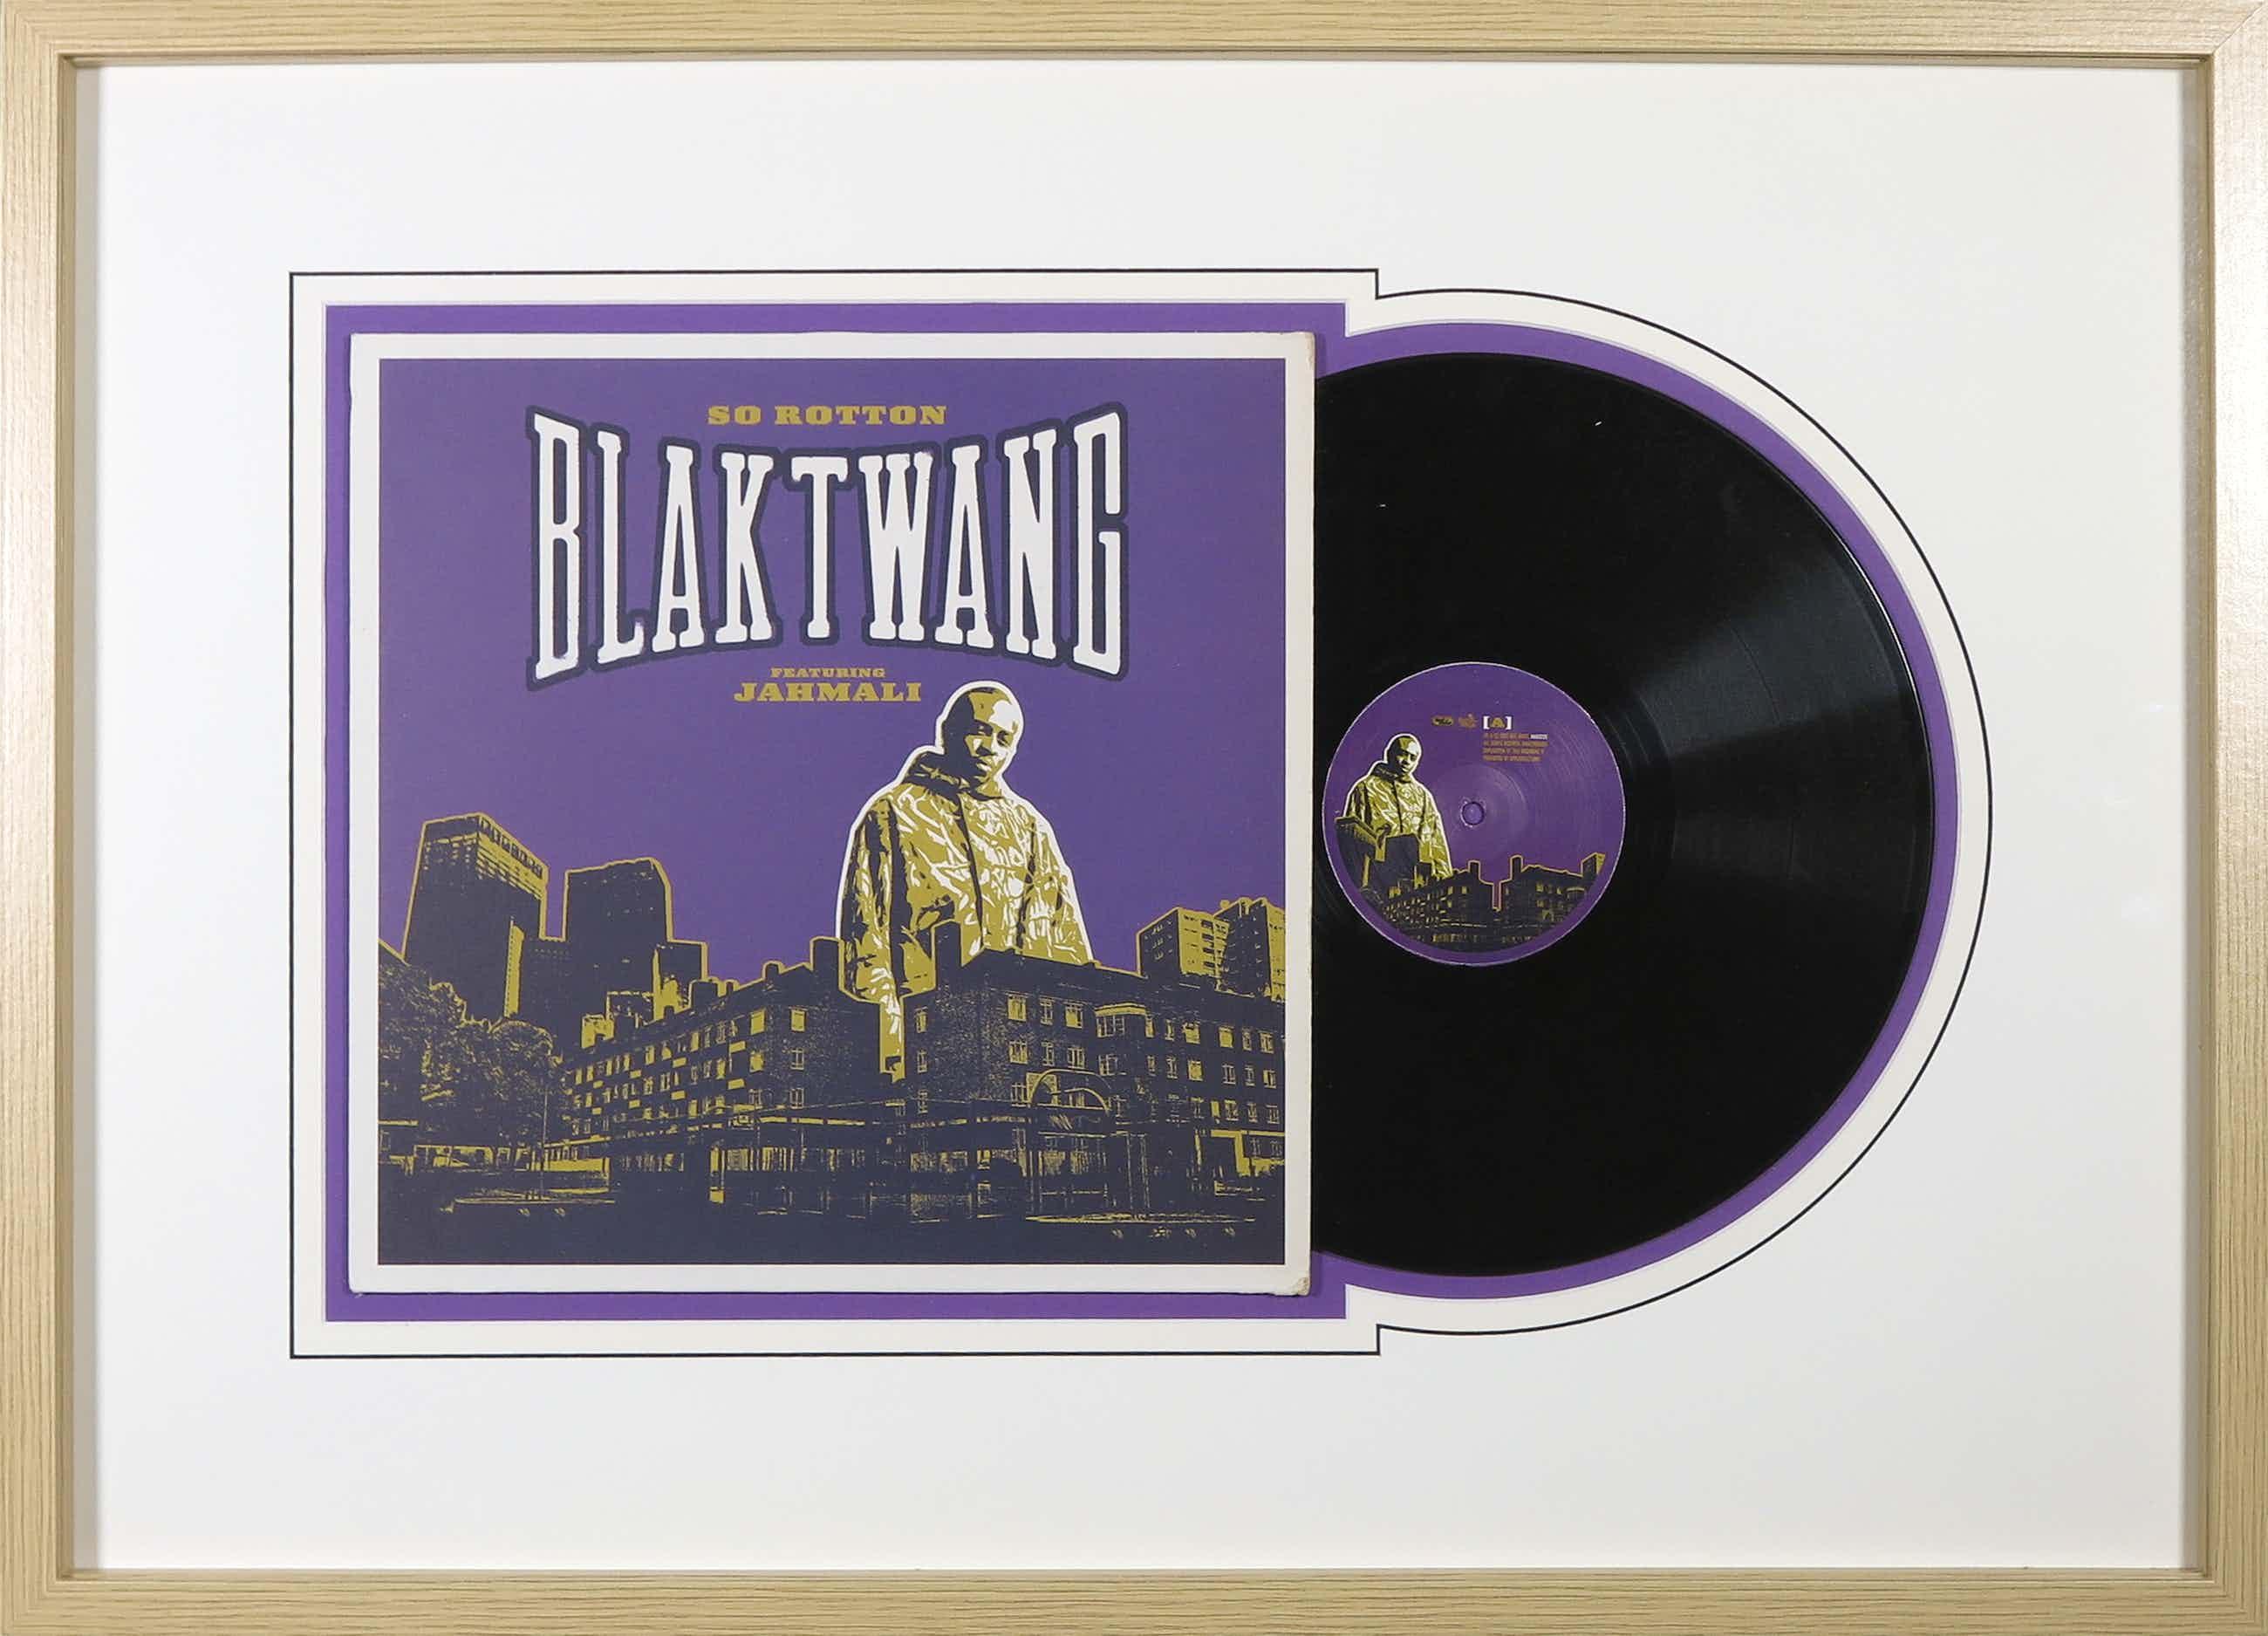 Banksy - LP-hoes, Blaktwang ft. Jahmali: So Rotton - Ingelijst kopen? Bied vanaf 150!